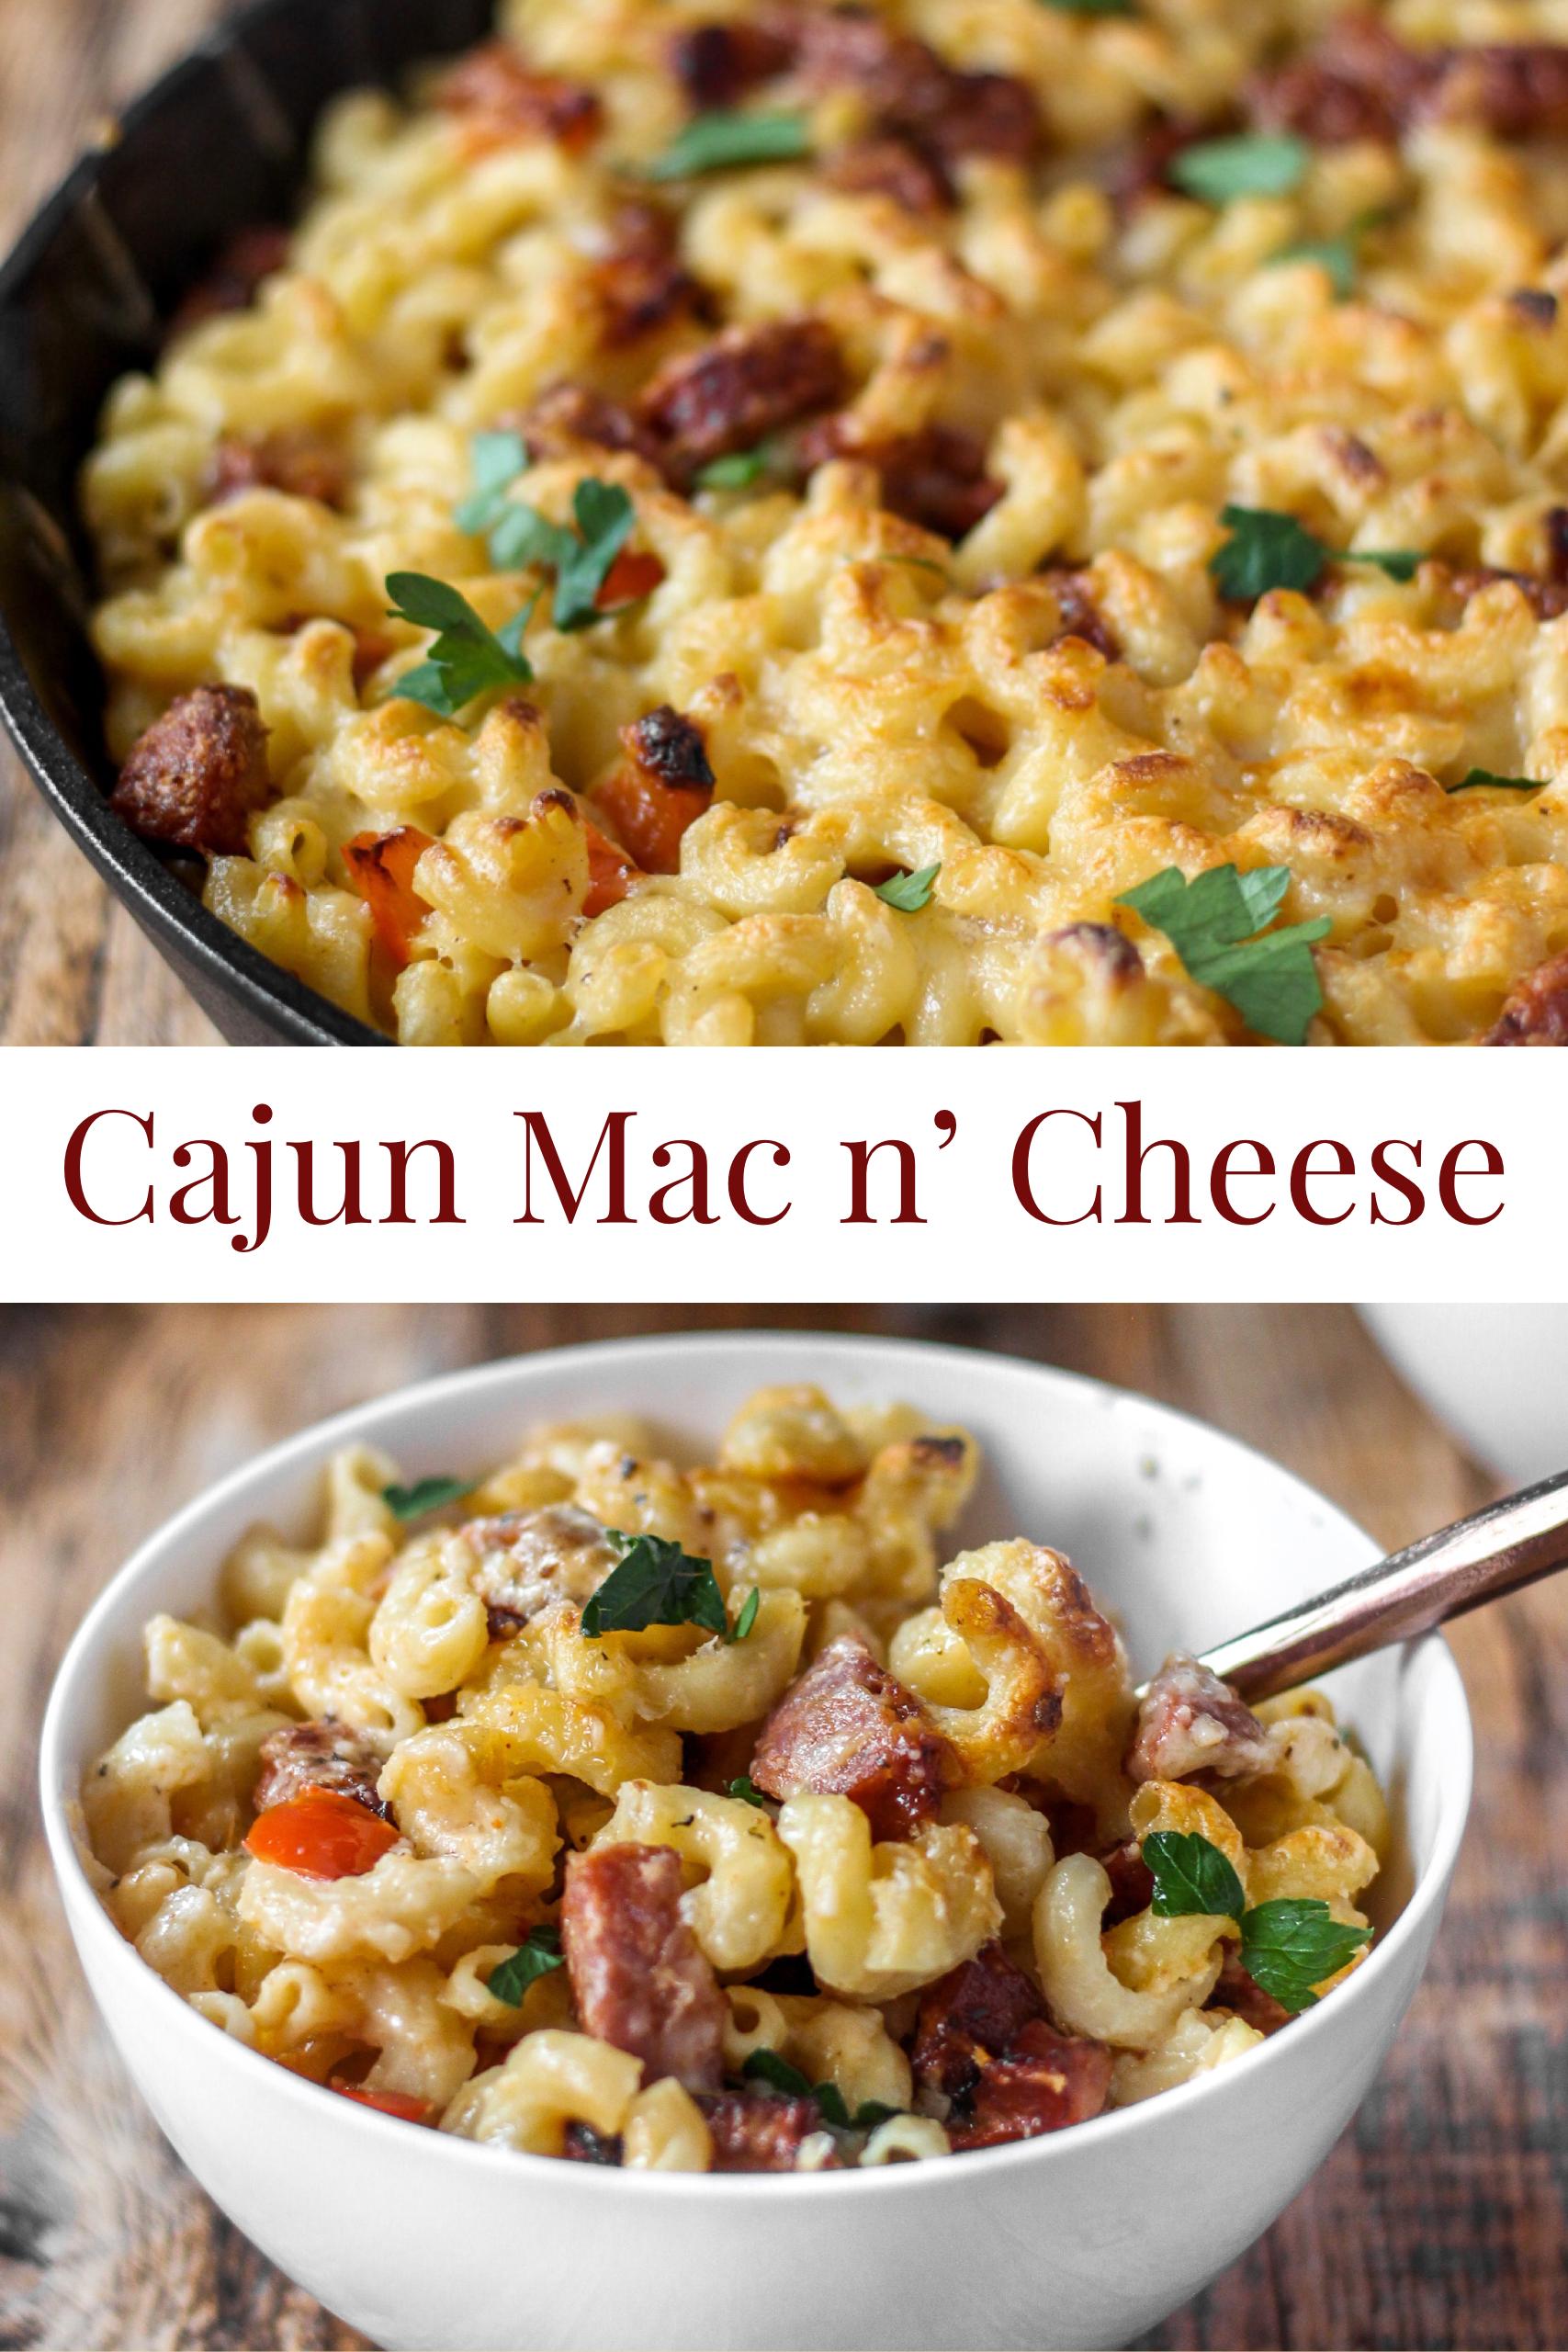 Cajun Mac and Cheese